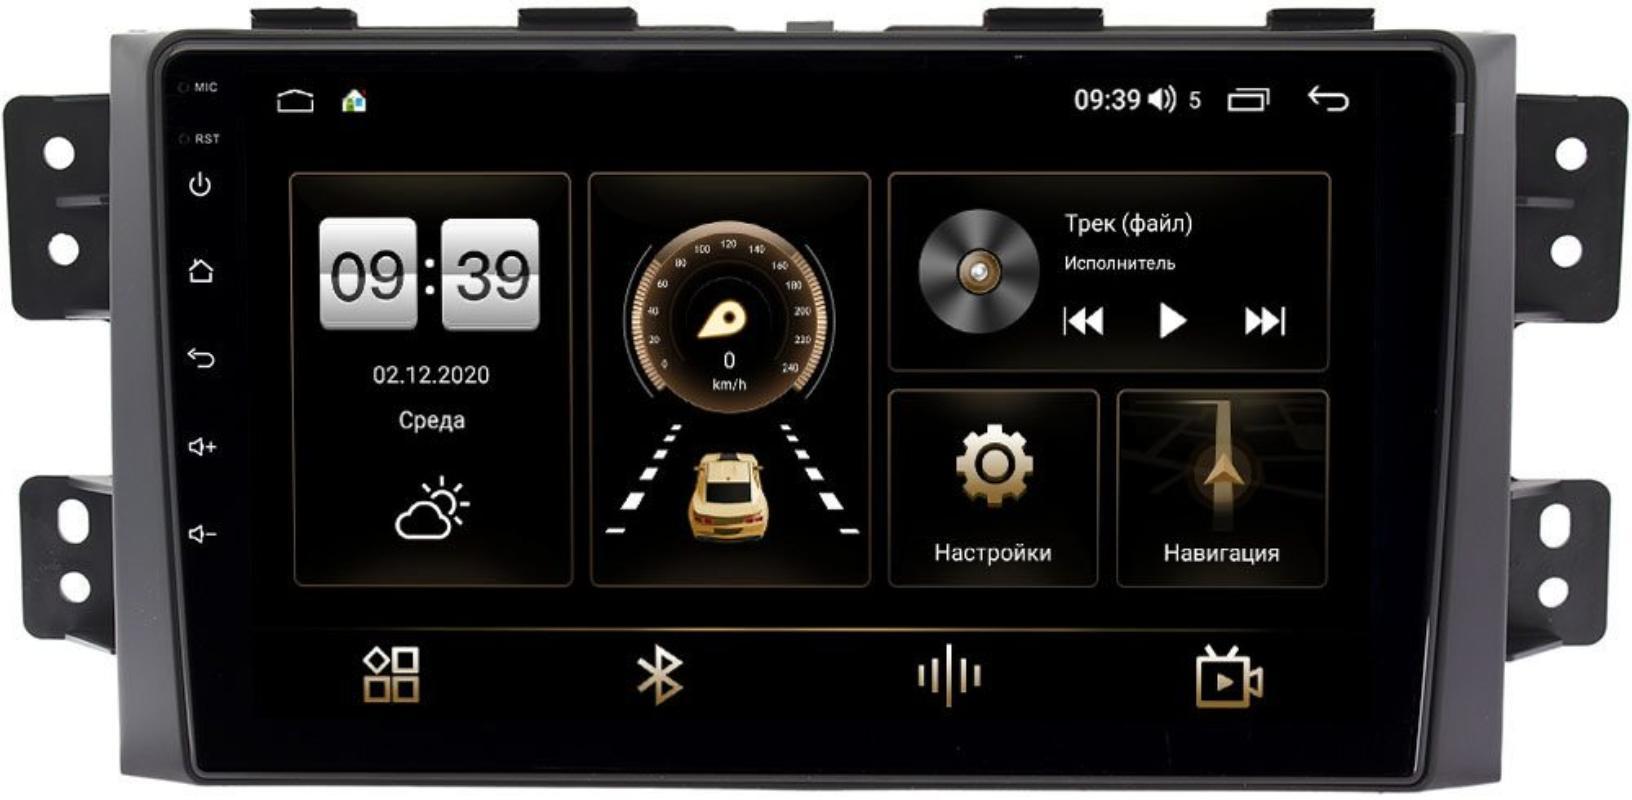 Штатная магнитола Kia Mohave I 2008-2018 LeTrun 4196-9142 на Android 10 (6/128, DSP, QLed) С оптическим выходом (+ Камера заднего вида в подарок!)